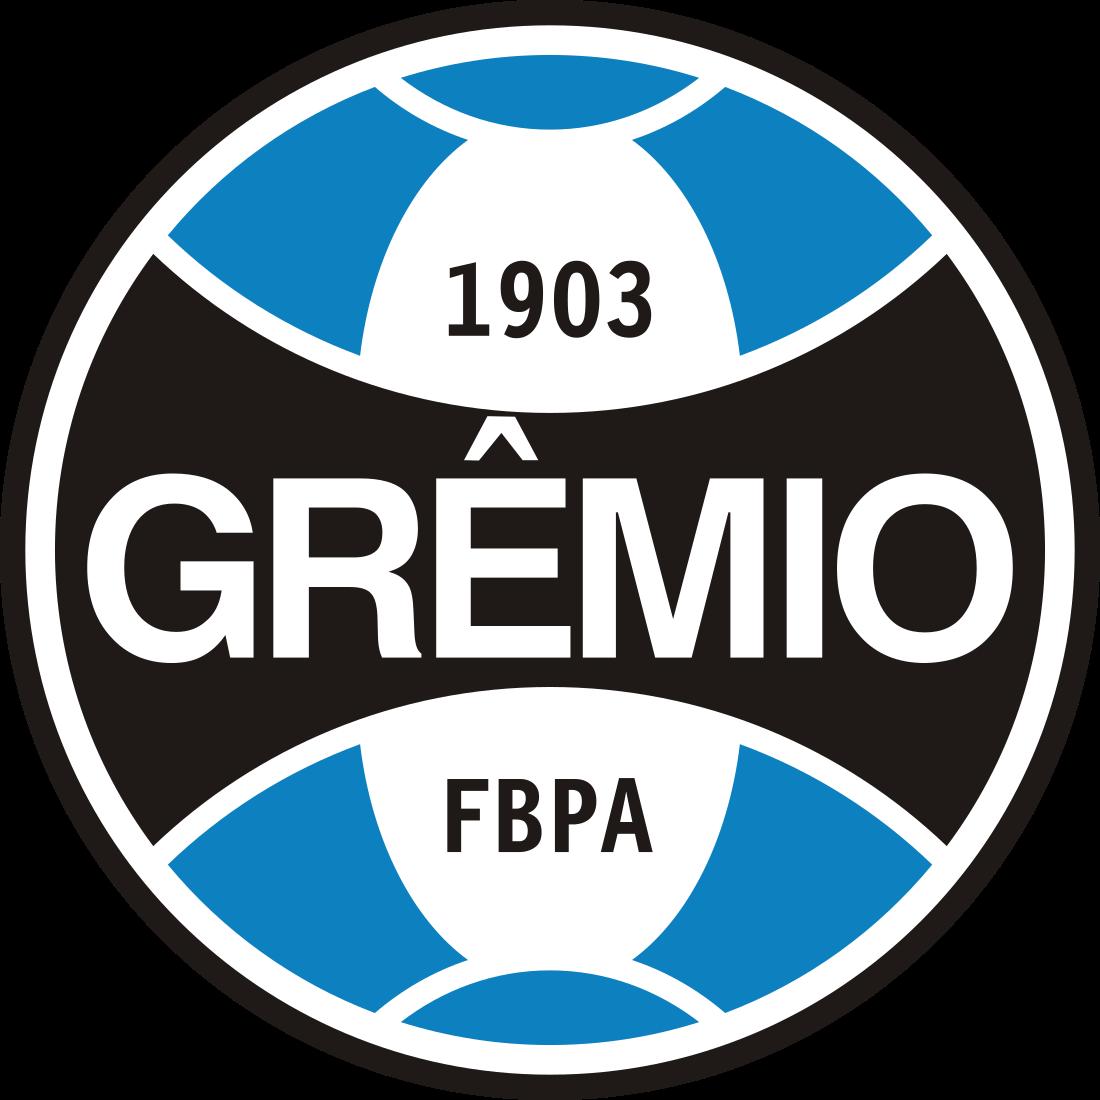 gremio logo escudo 6 - Grêmio Logo - Grêmio Escudo